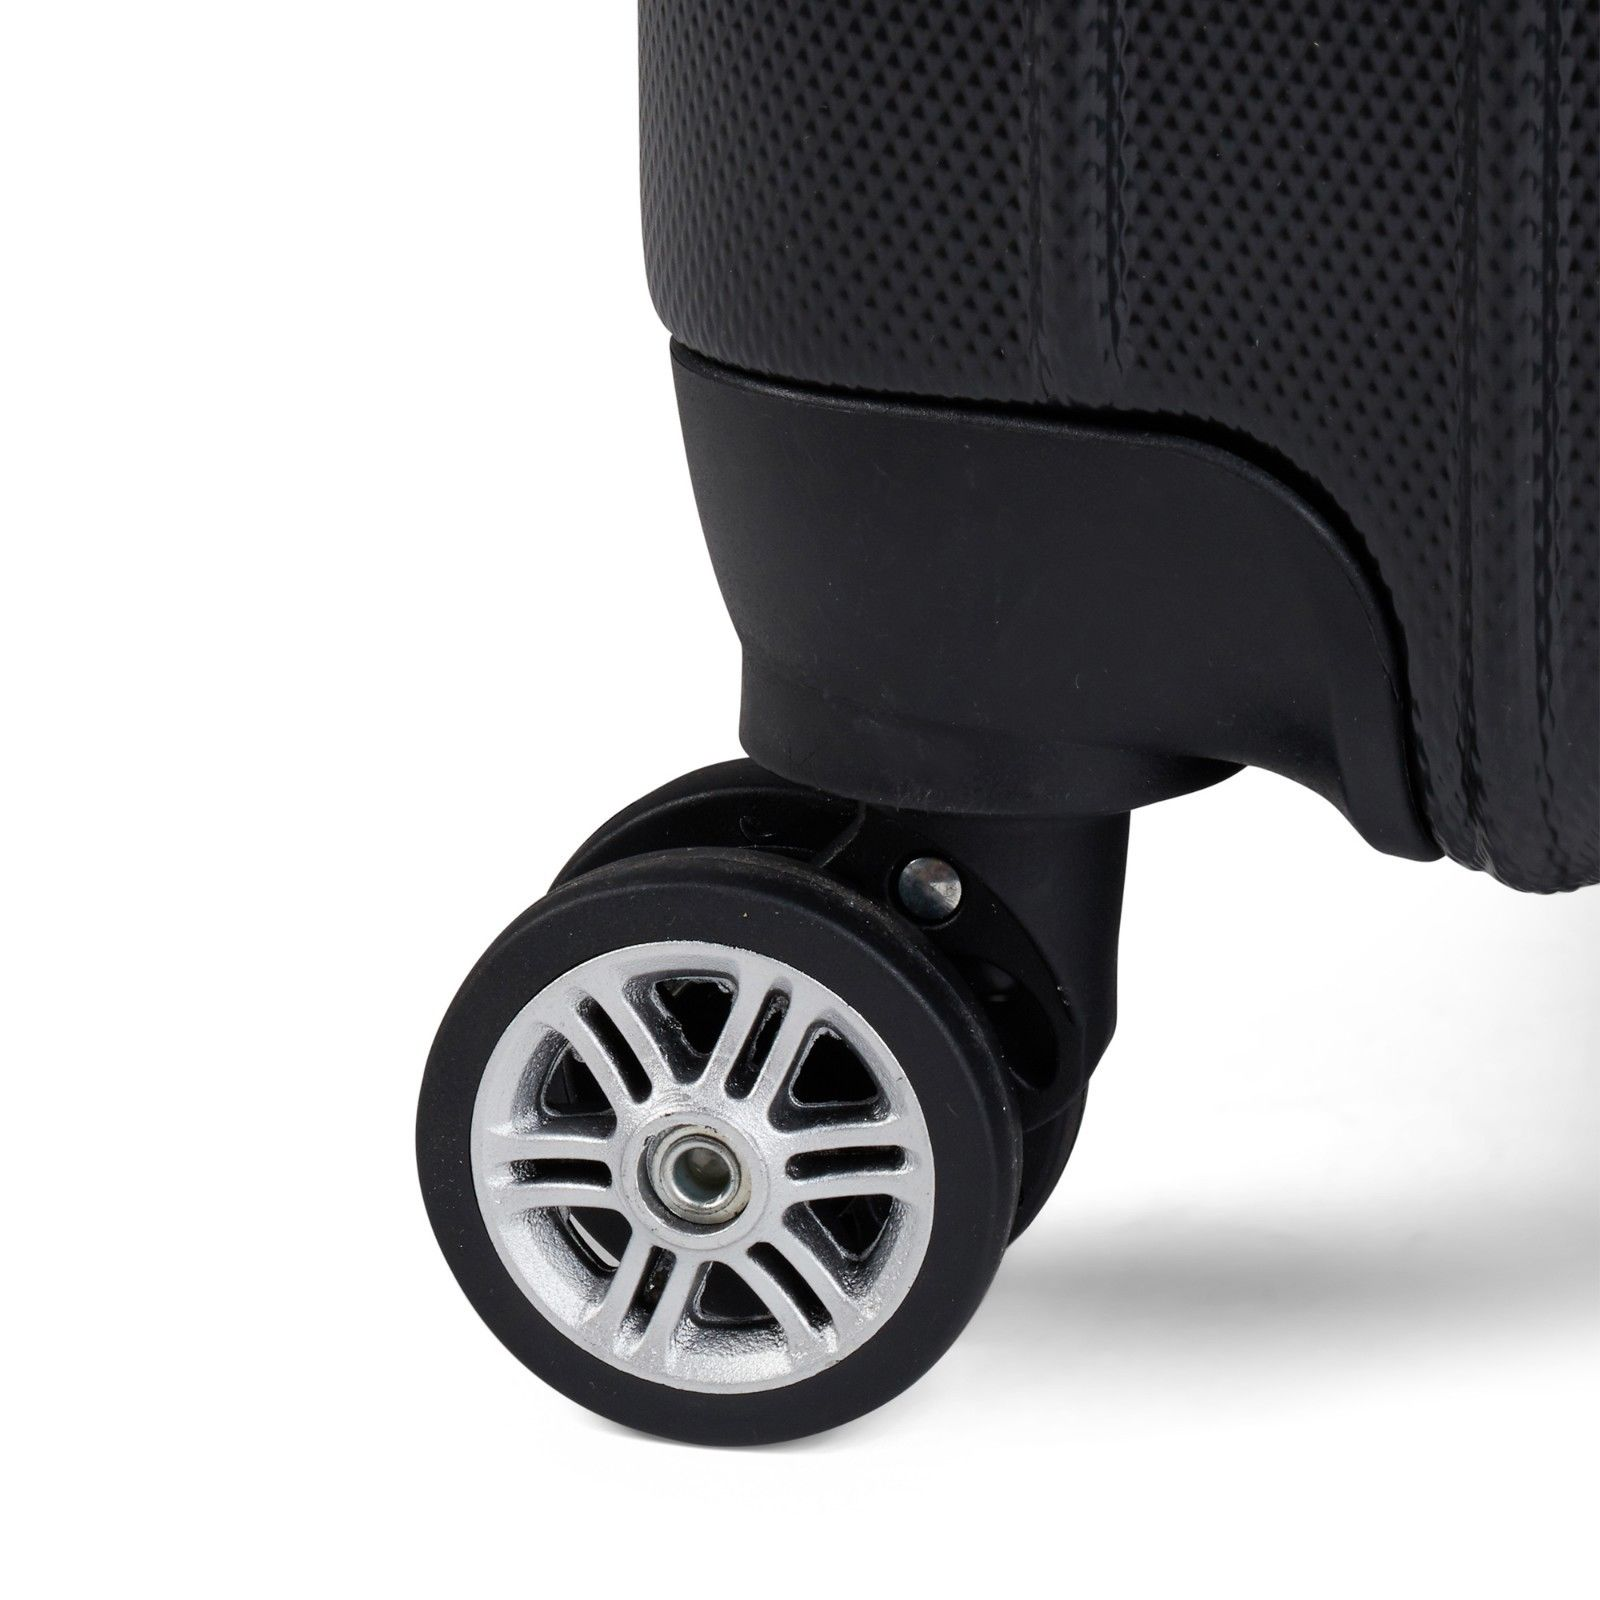 Milano-Premium-3pc-ABS-Luggage-Suitcase-Luxury-Hard-Case-Shockproof-Travel-Set thumbnail 14